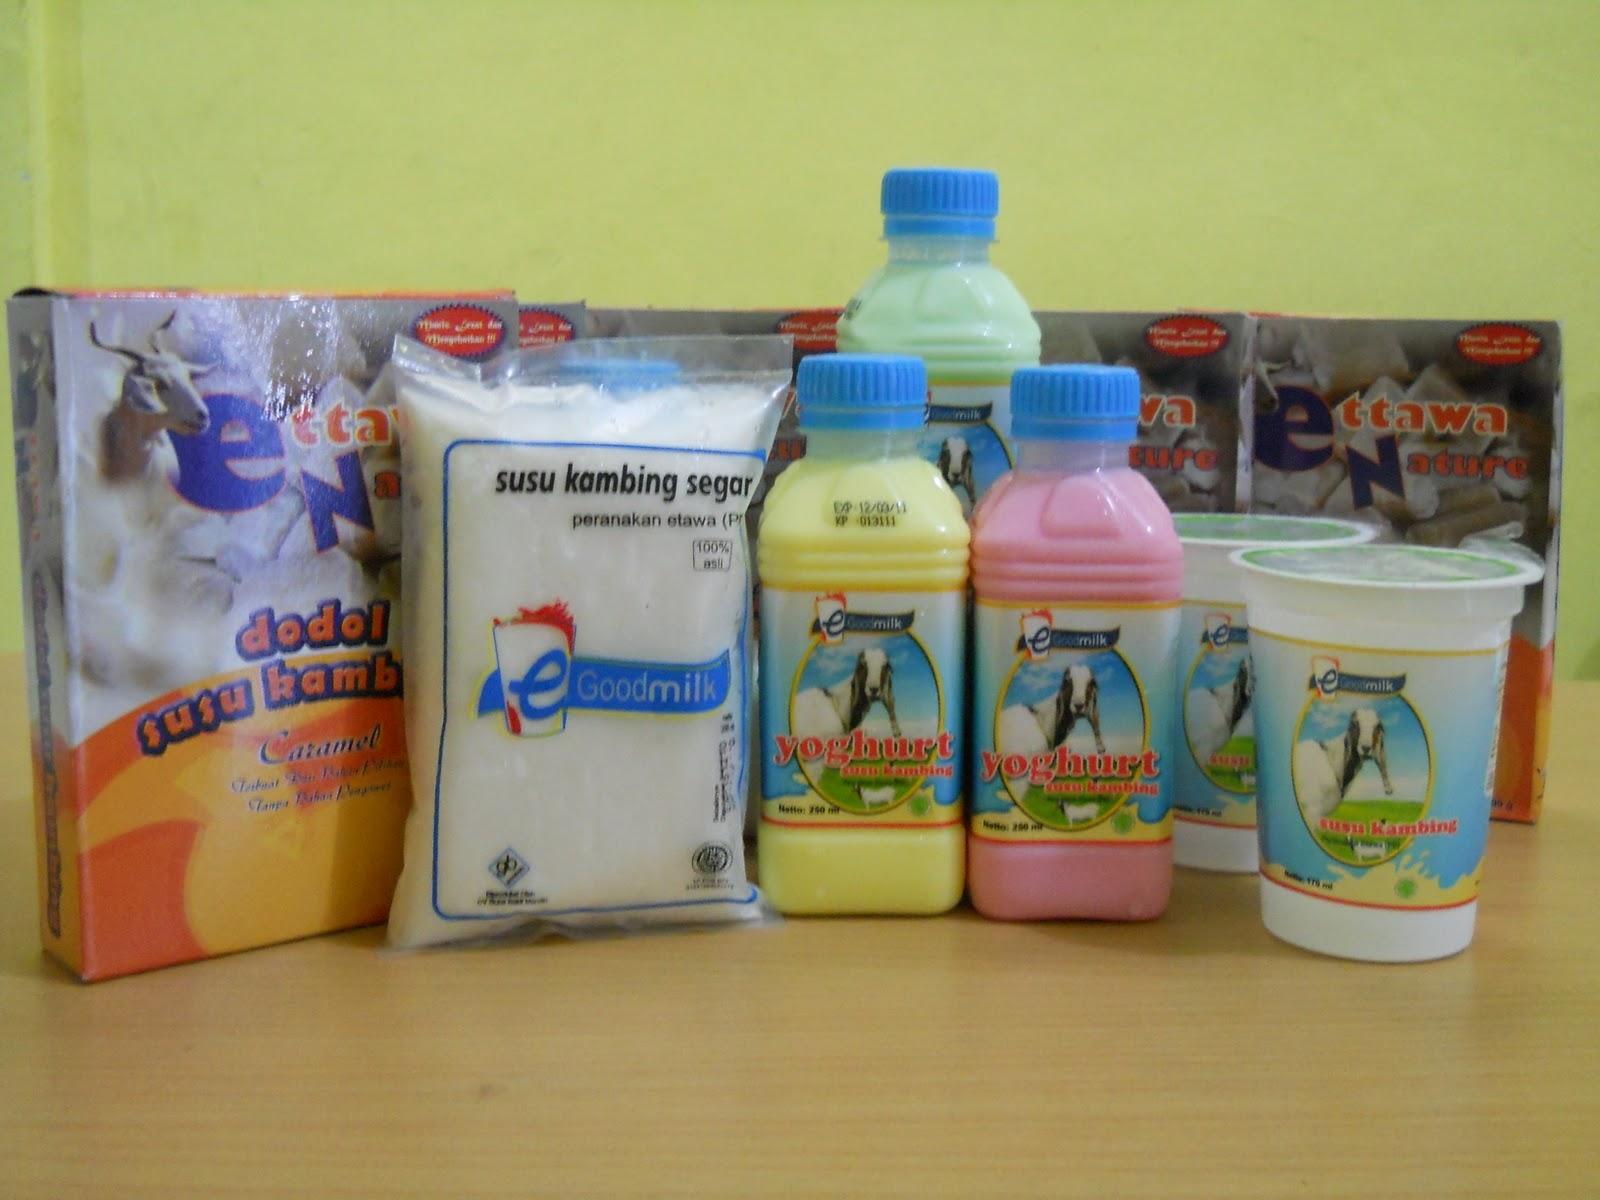 Susu Kambing egoodmilk: Yoghurt Susu Kambing